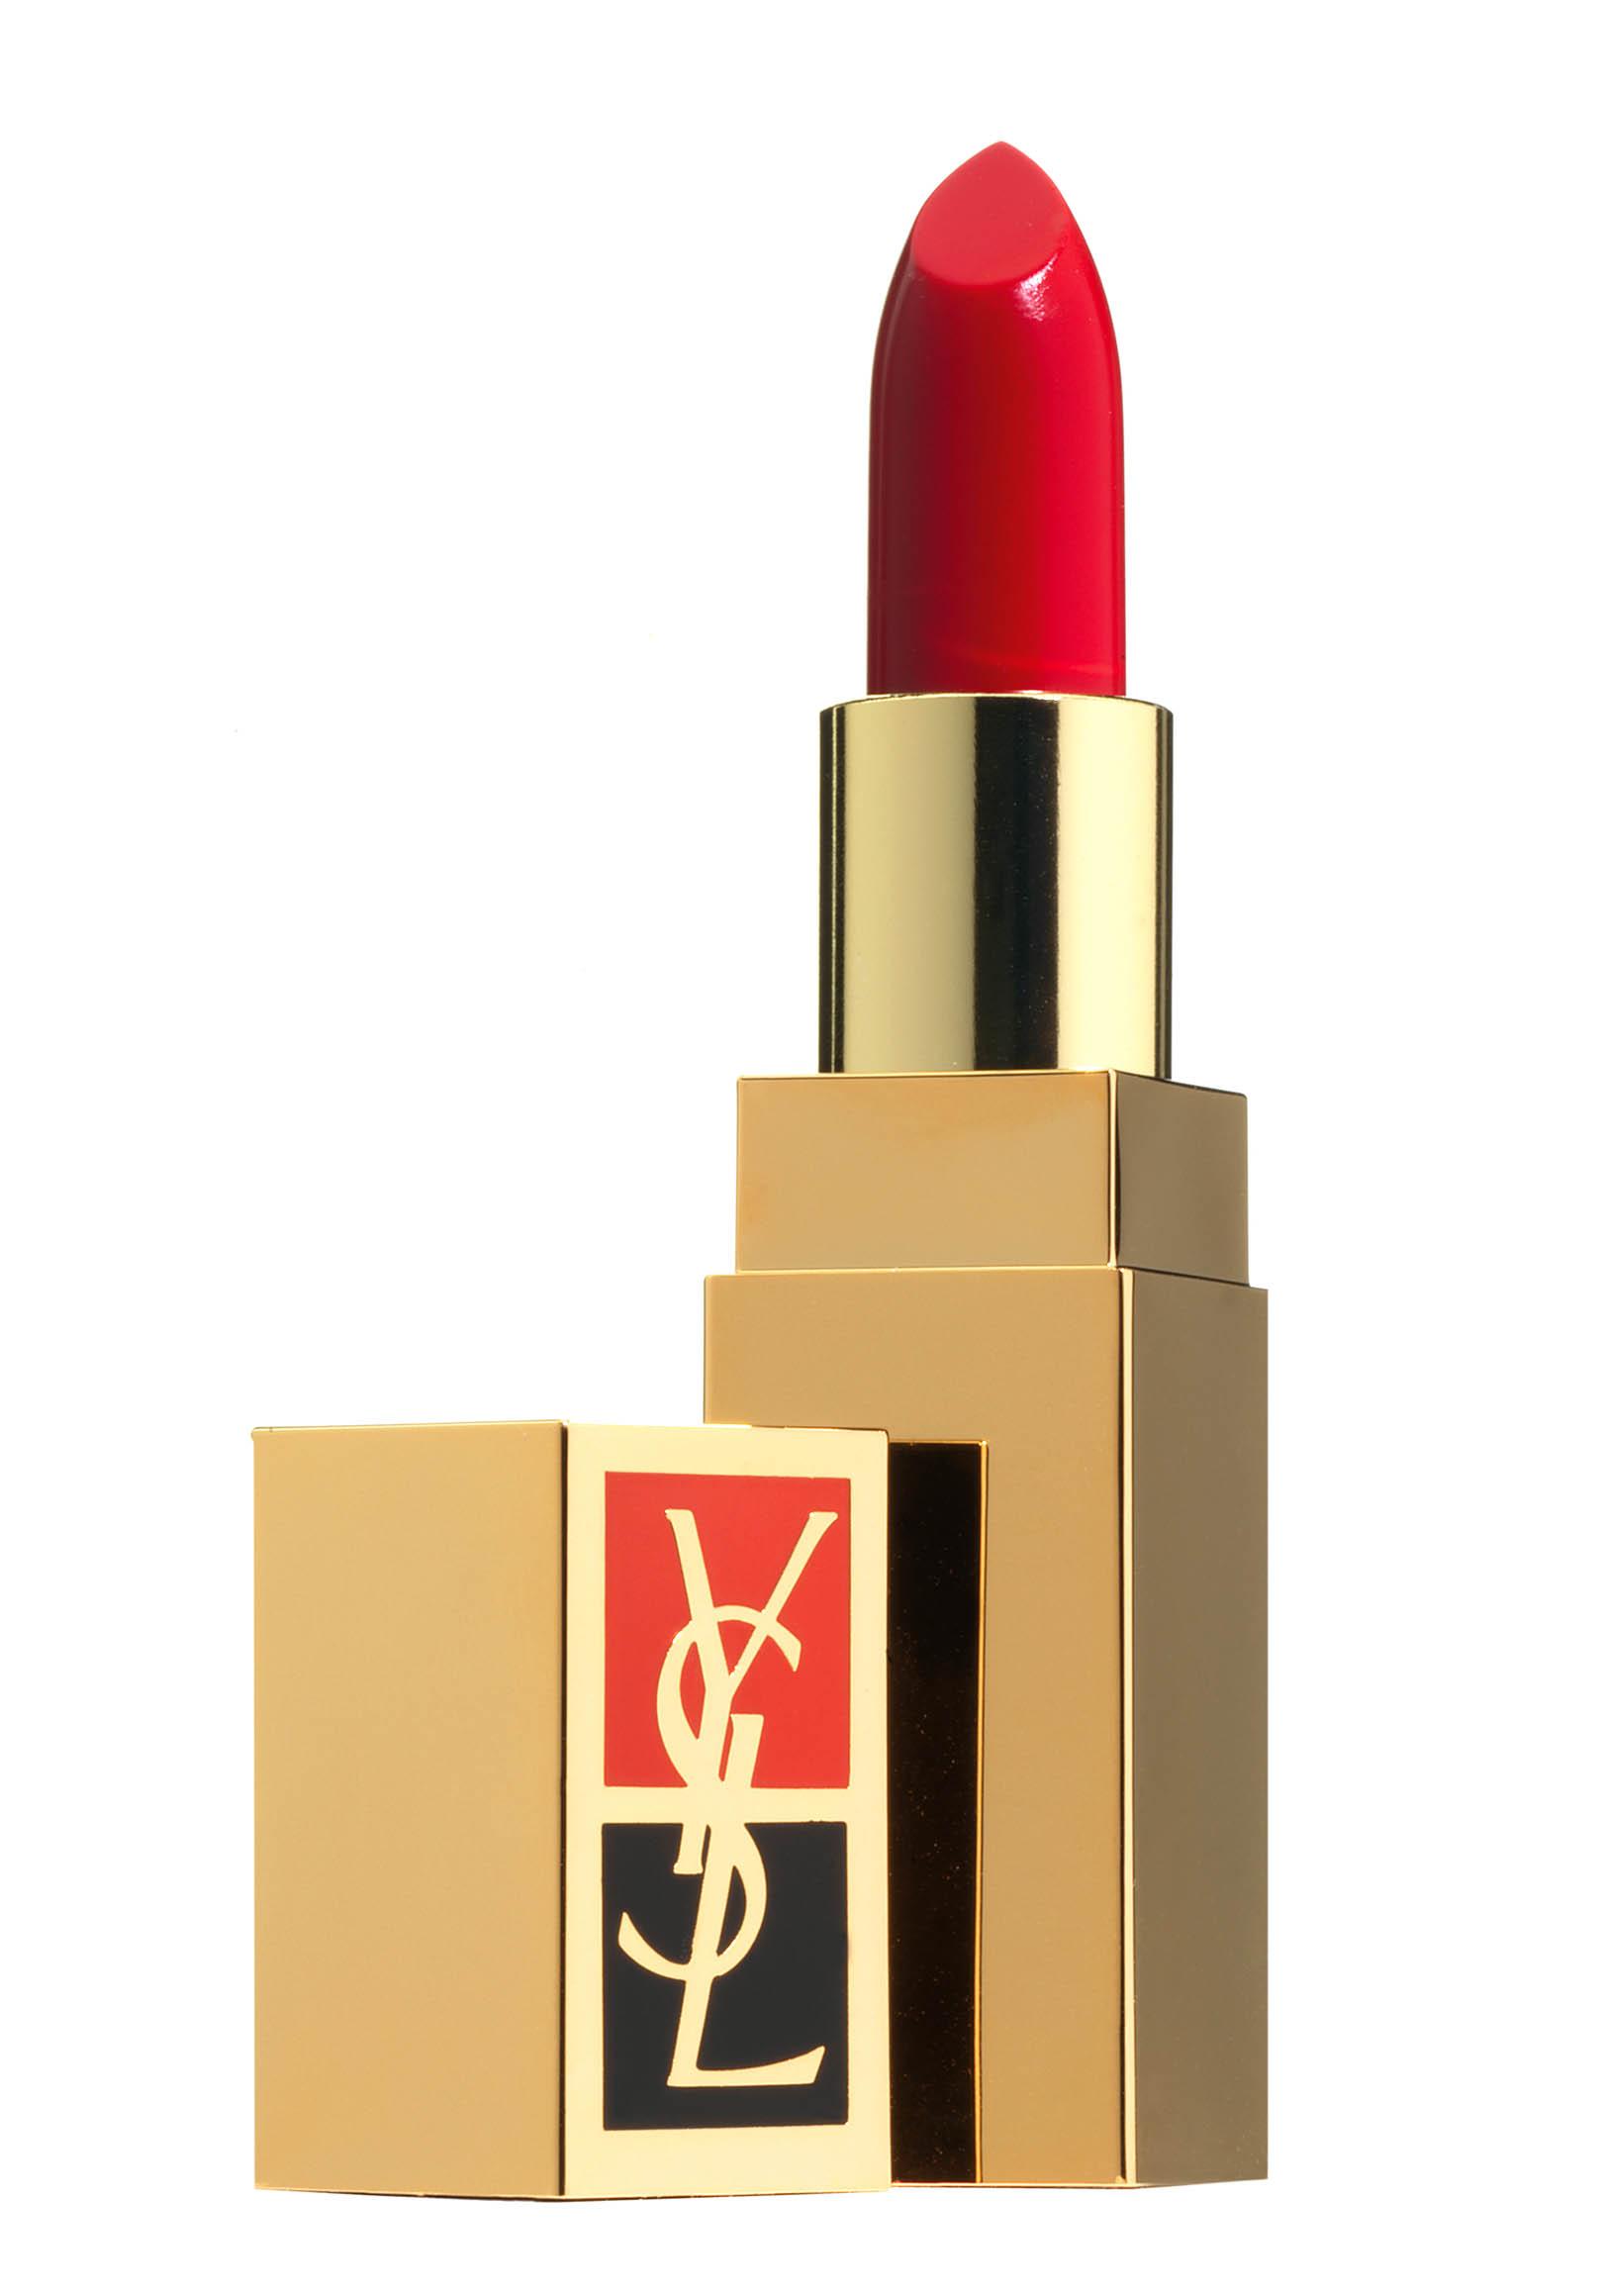 ysl lipstick new aa.jpg